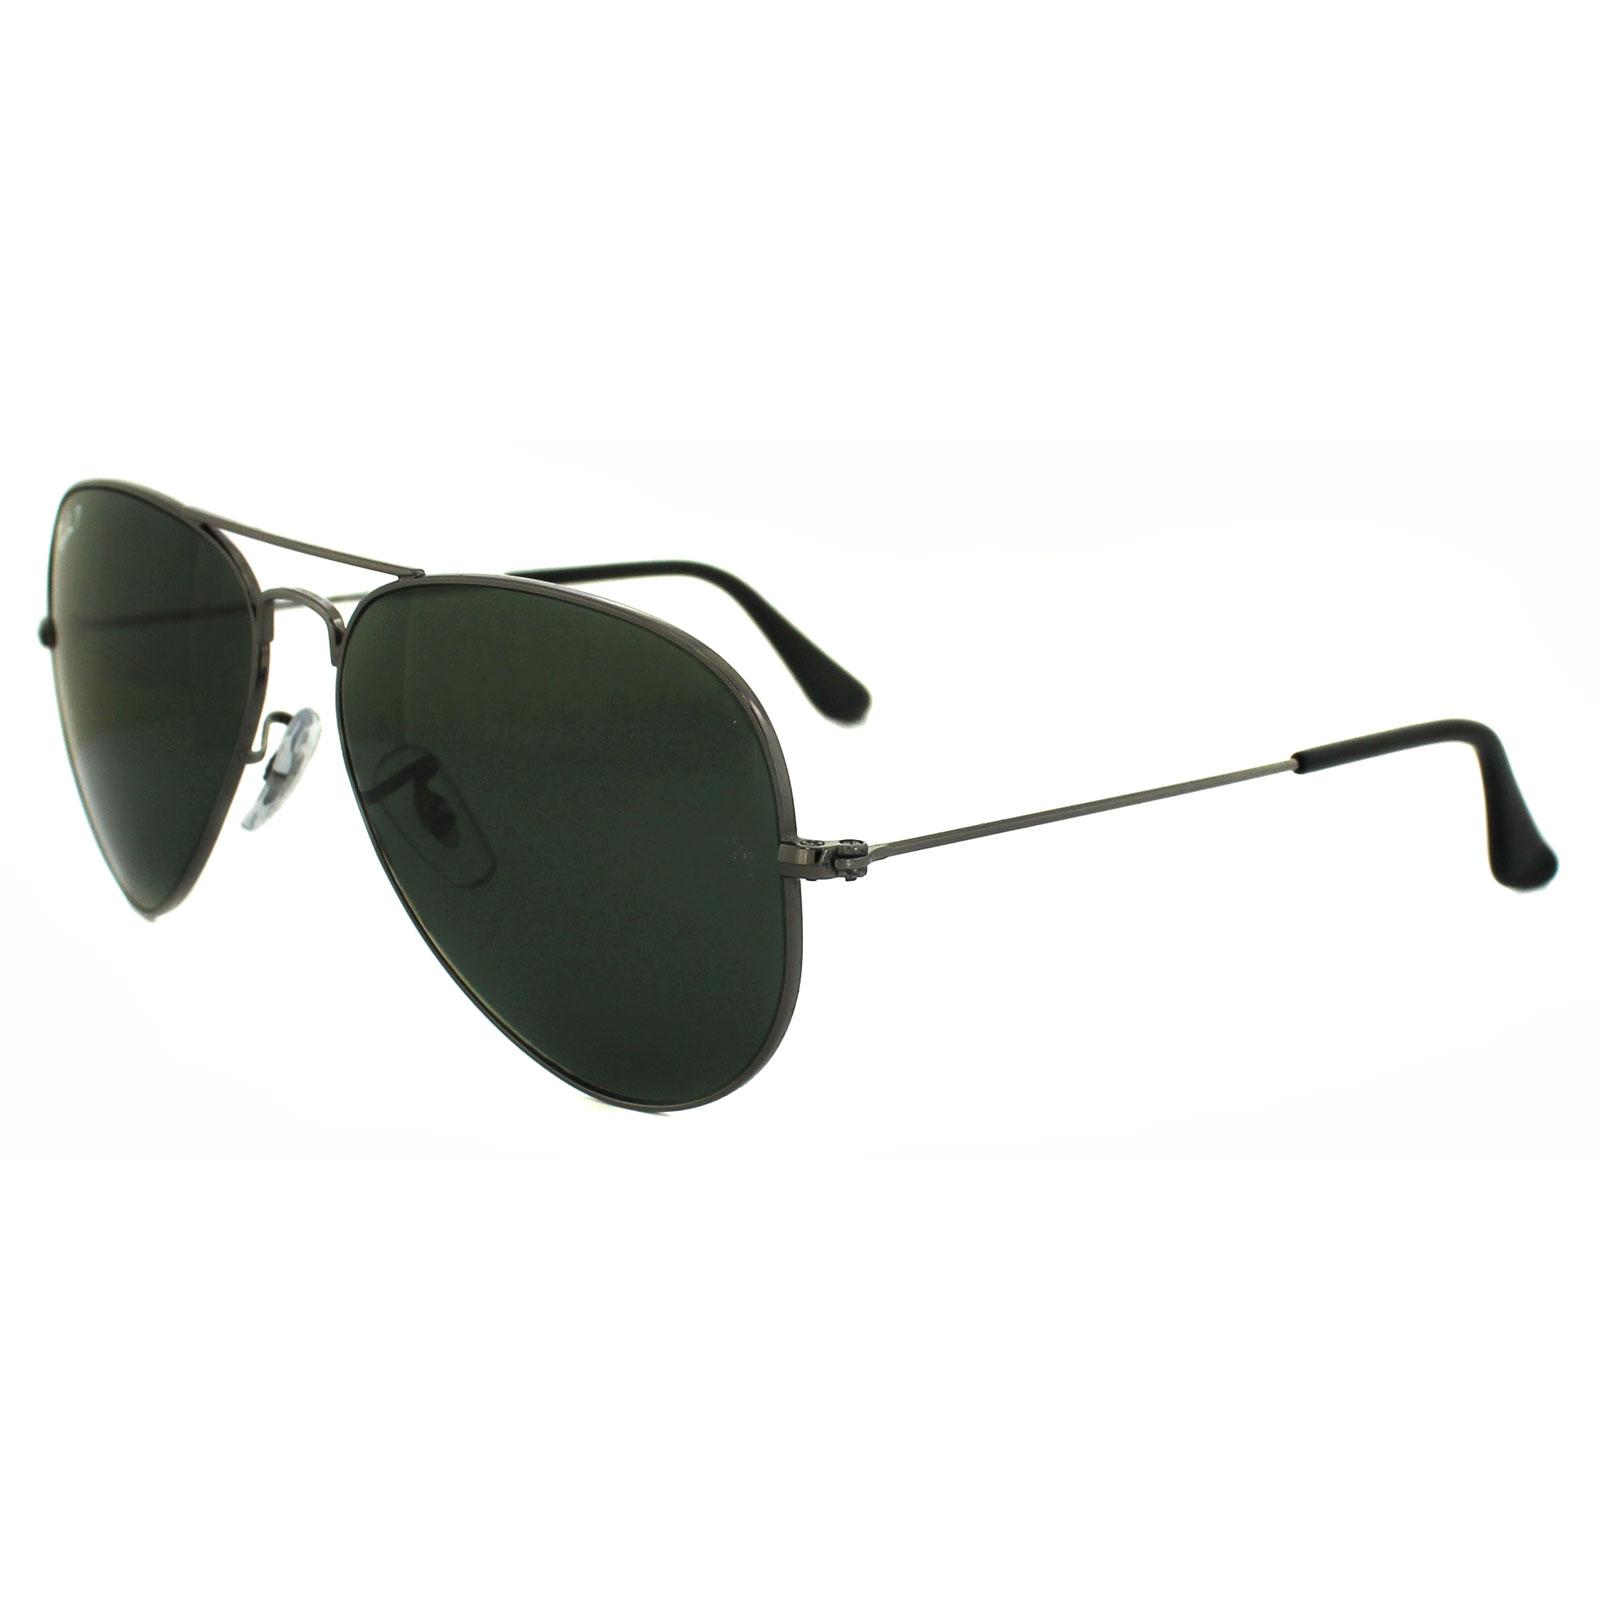 Sentinel Rayban Sunglasses Aviator 3025 004 58 Polarized 58mm 305e71570a